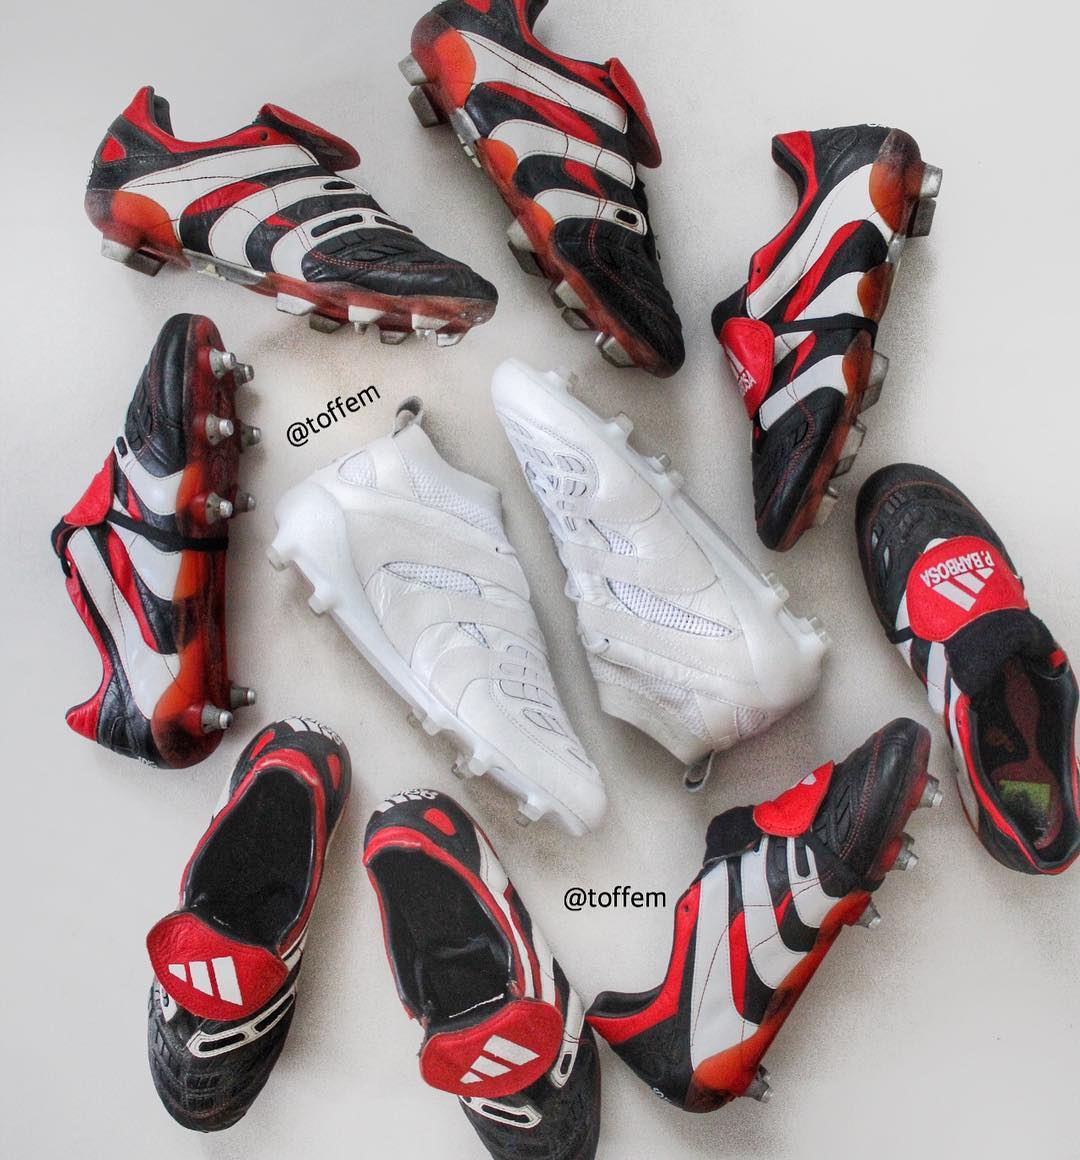 Full Adidas Predator History - 1994-2018